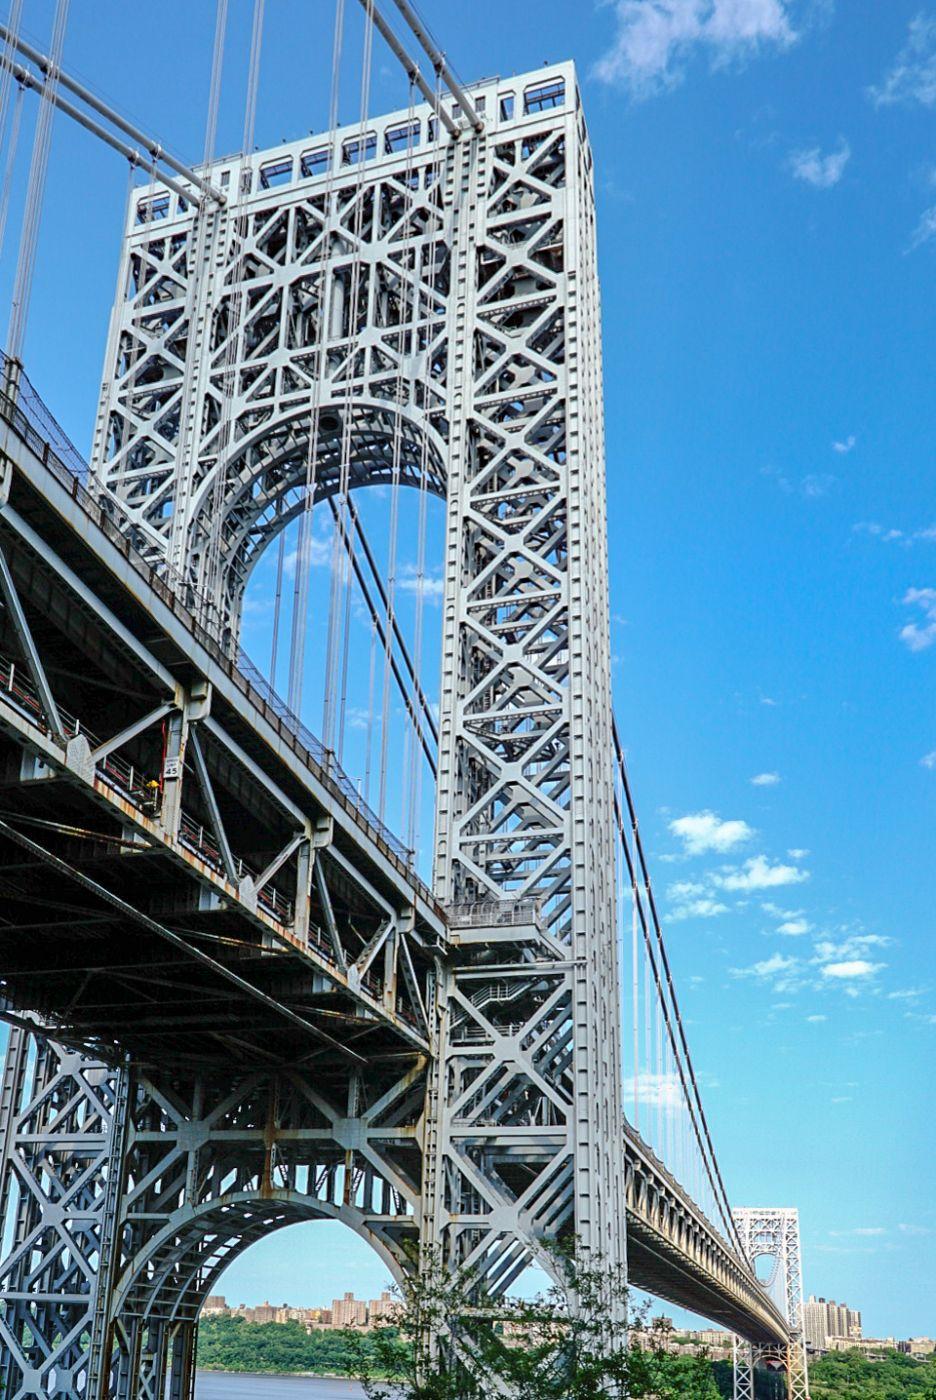 George Washington Bridge, USA